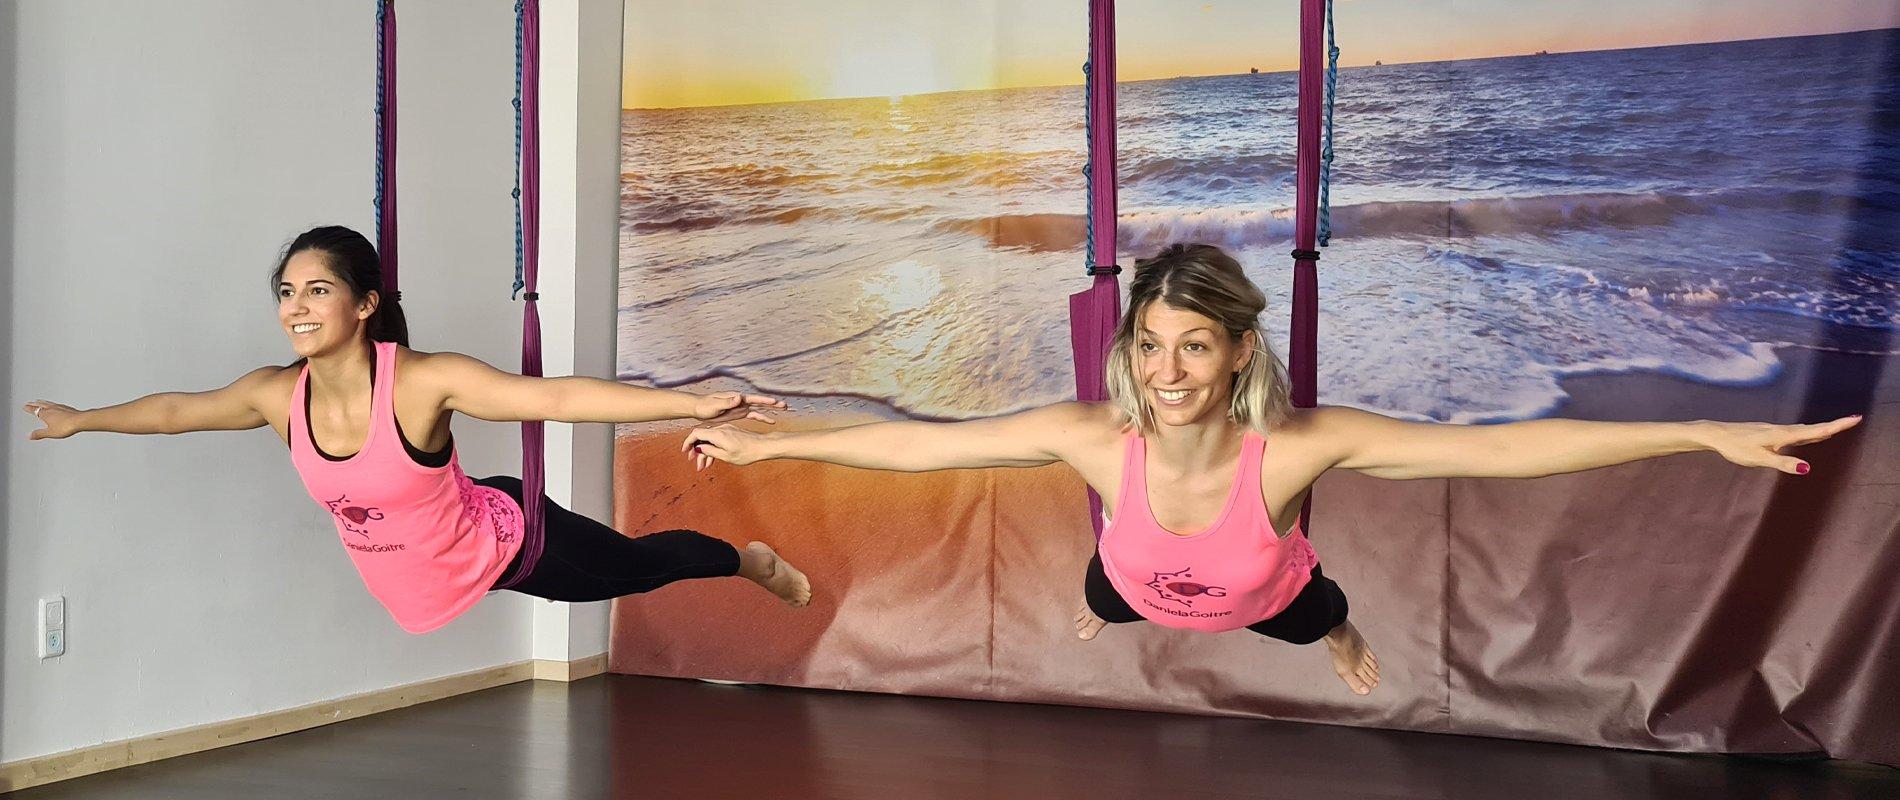 Centro Daniela Goitre - Taekwondo ITF y Pilates Aéreo en Zaragoza